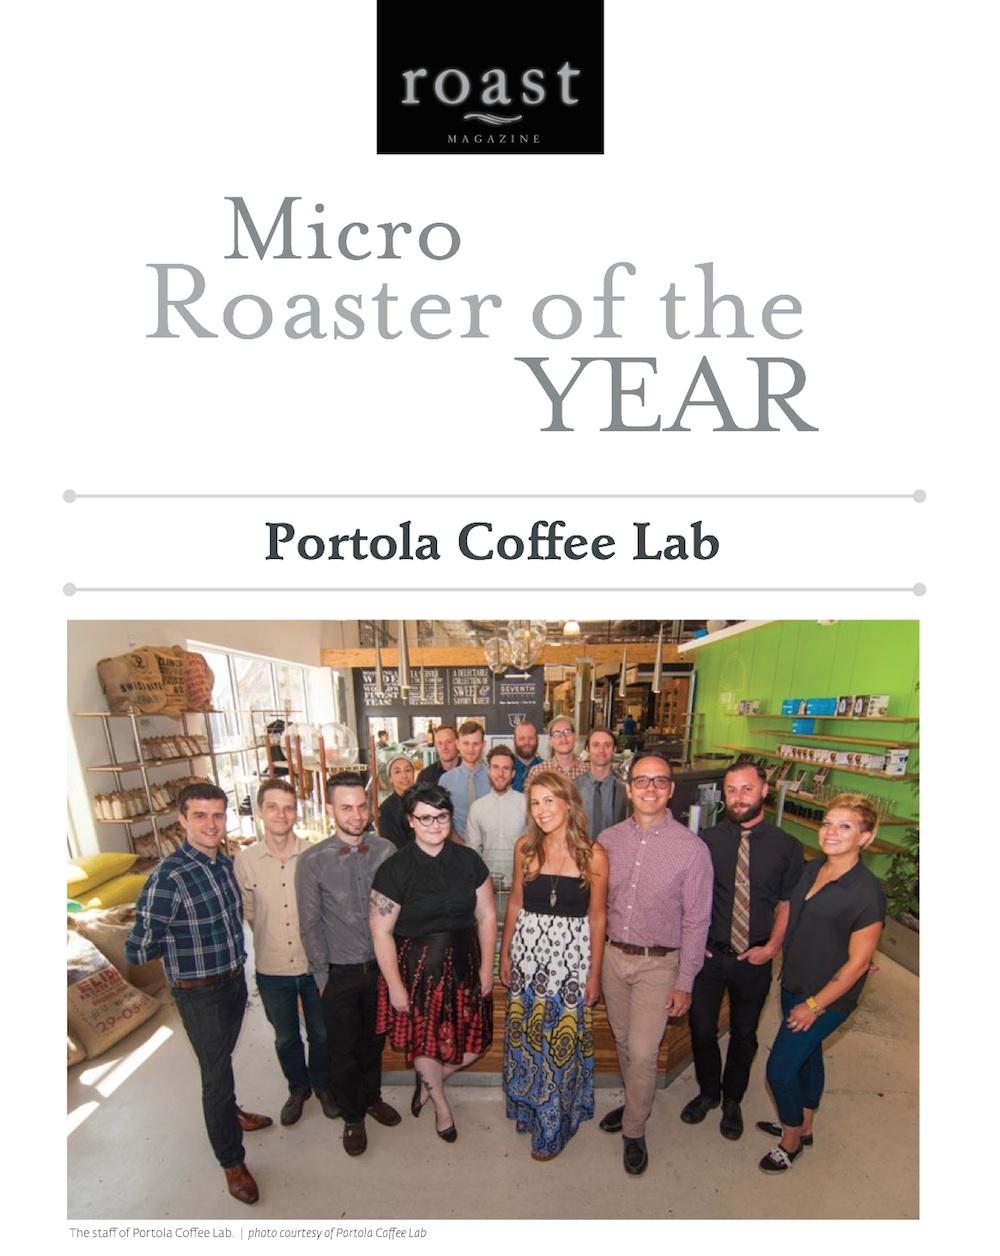 Roast Magazine 2014 Roaster of the Year Portola Coffee Lab